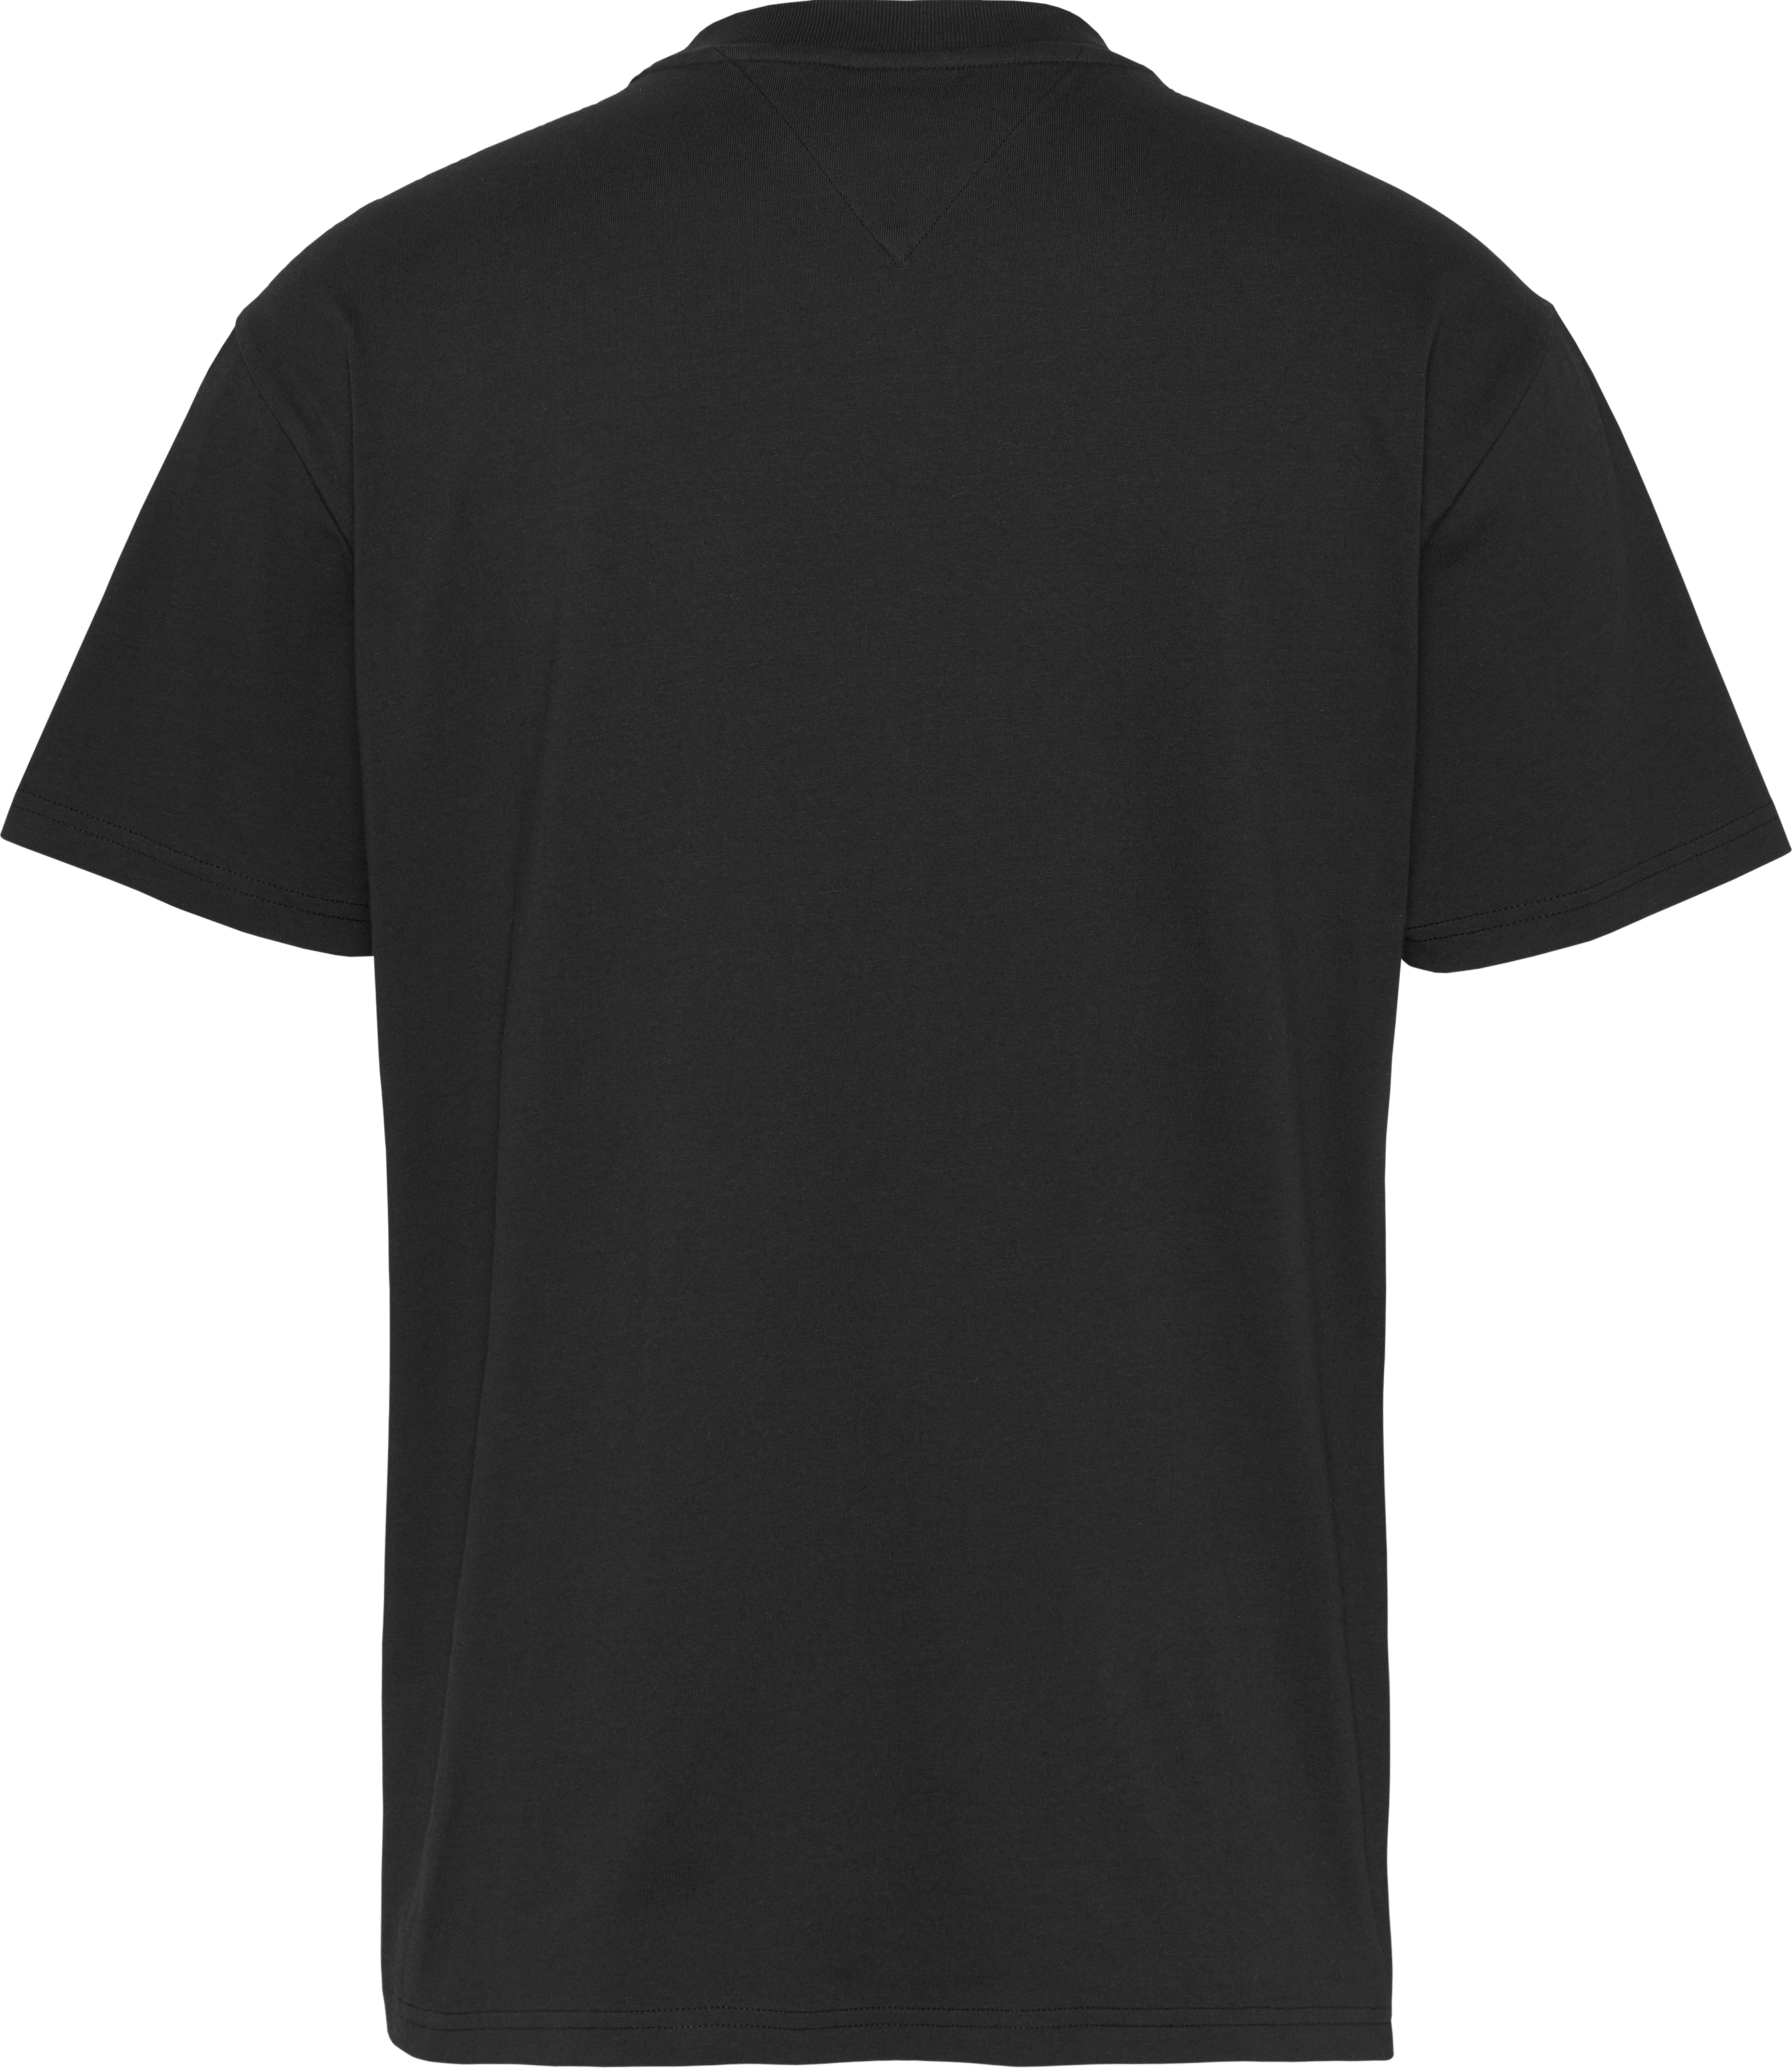 Tommy Hilfiger T-shirt, Sort, M